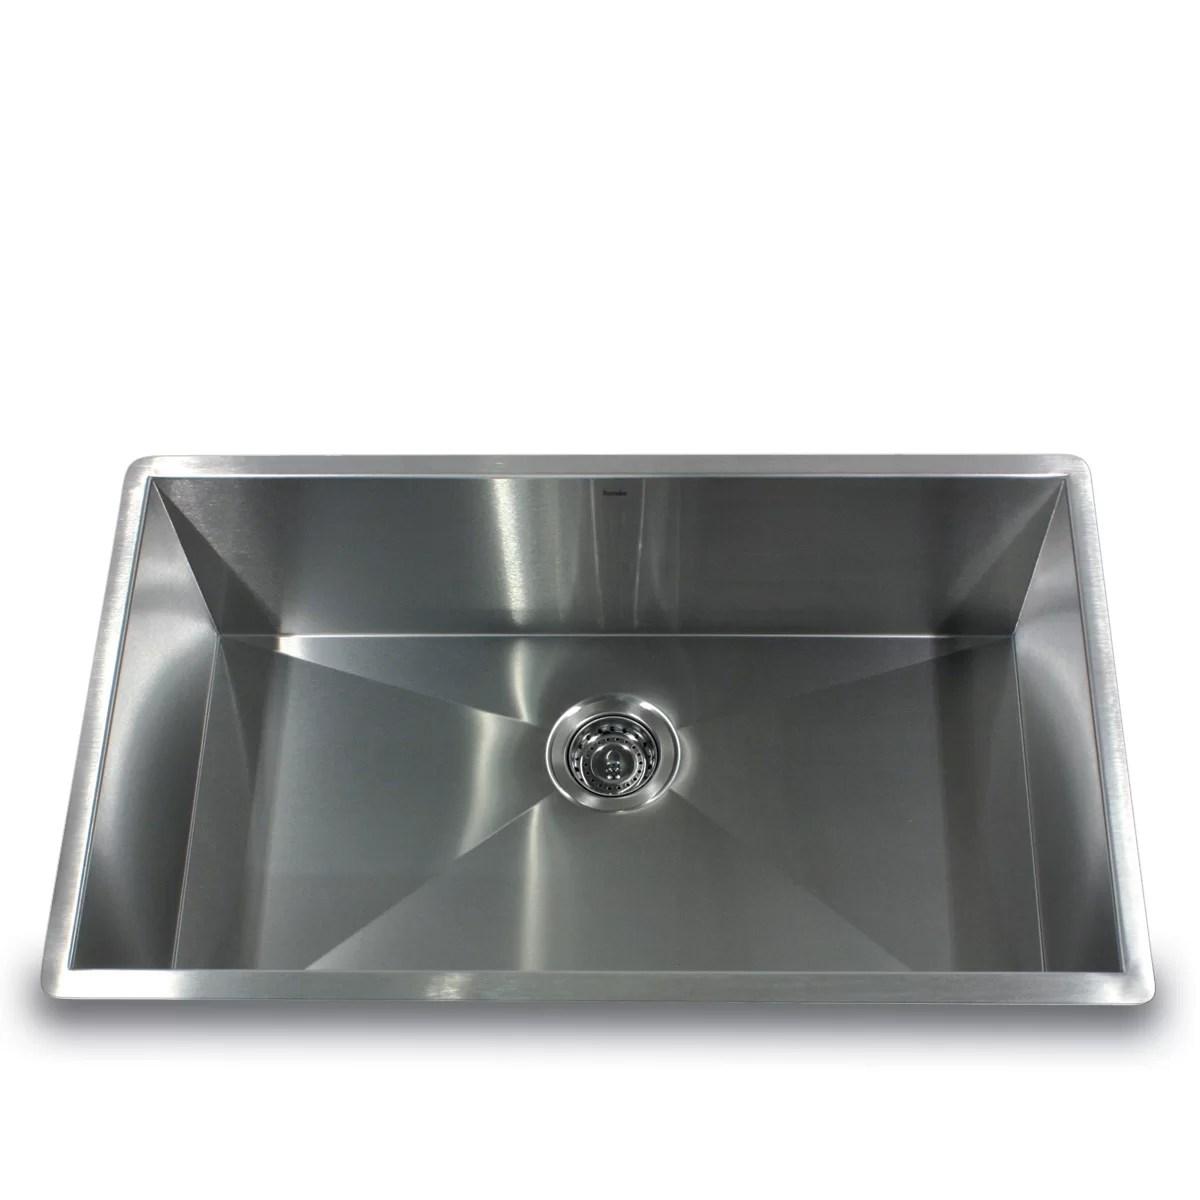 single bowl kitchen sinks discontinued cabinets nantucket 32 quot x 19 zero radius